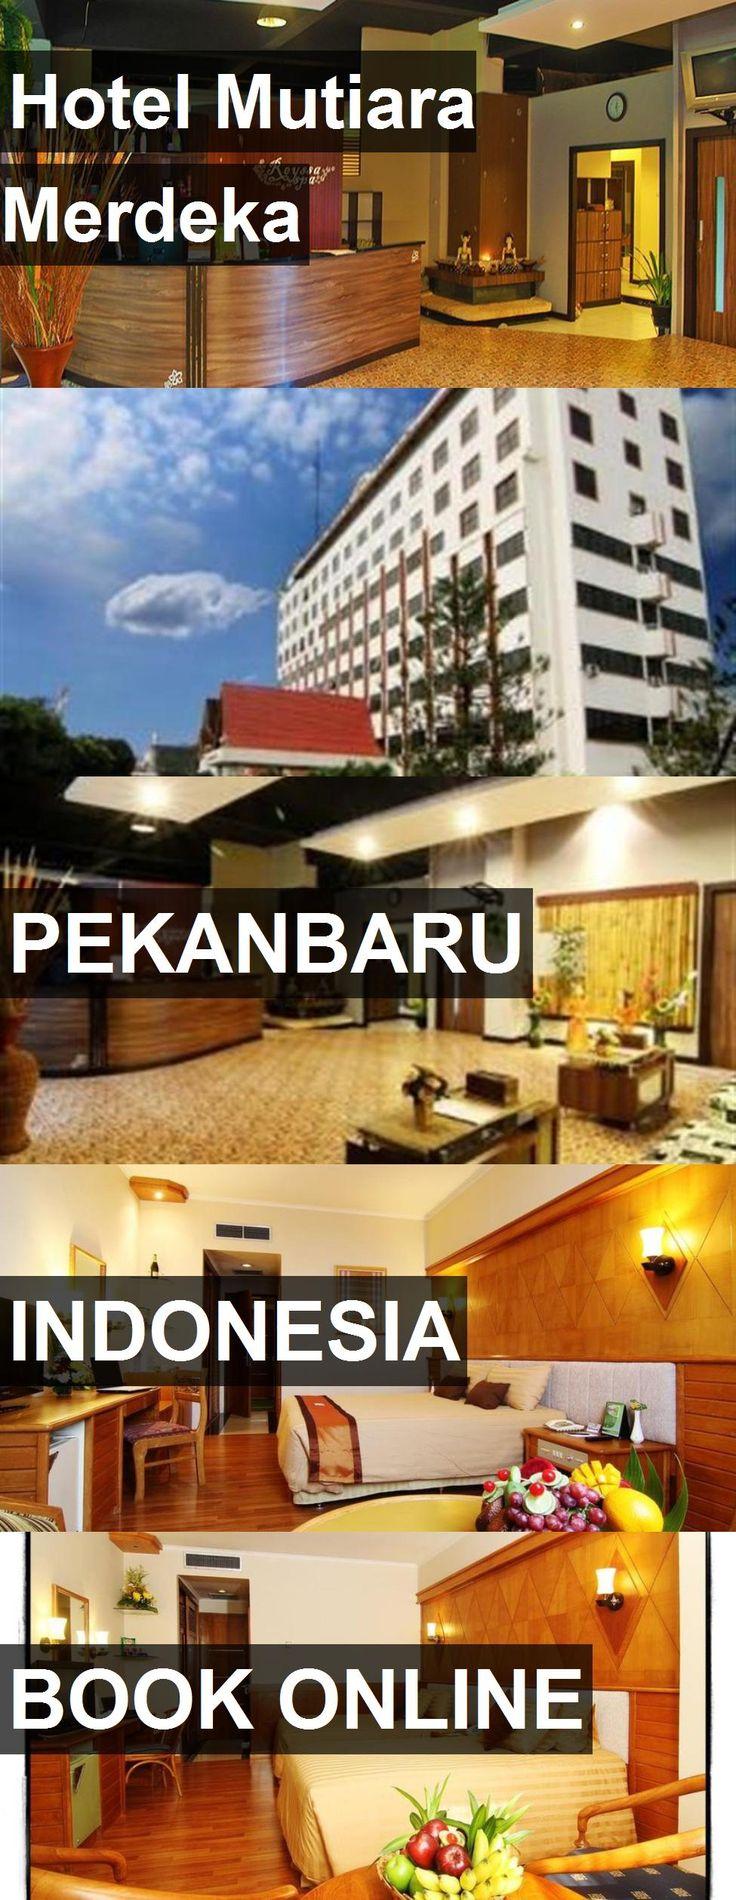 Hotel Mutiara Merdeka in Pekanbaru, Indonesia. For more information, photos, reviews and best prices please follow the link. #Indonesia #Pekanbaru #travel #vacation #hotel